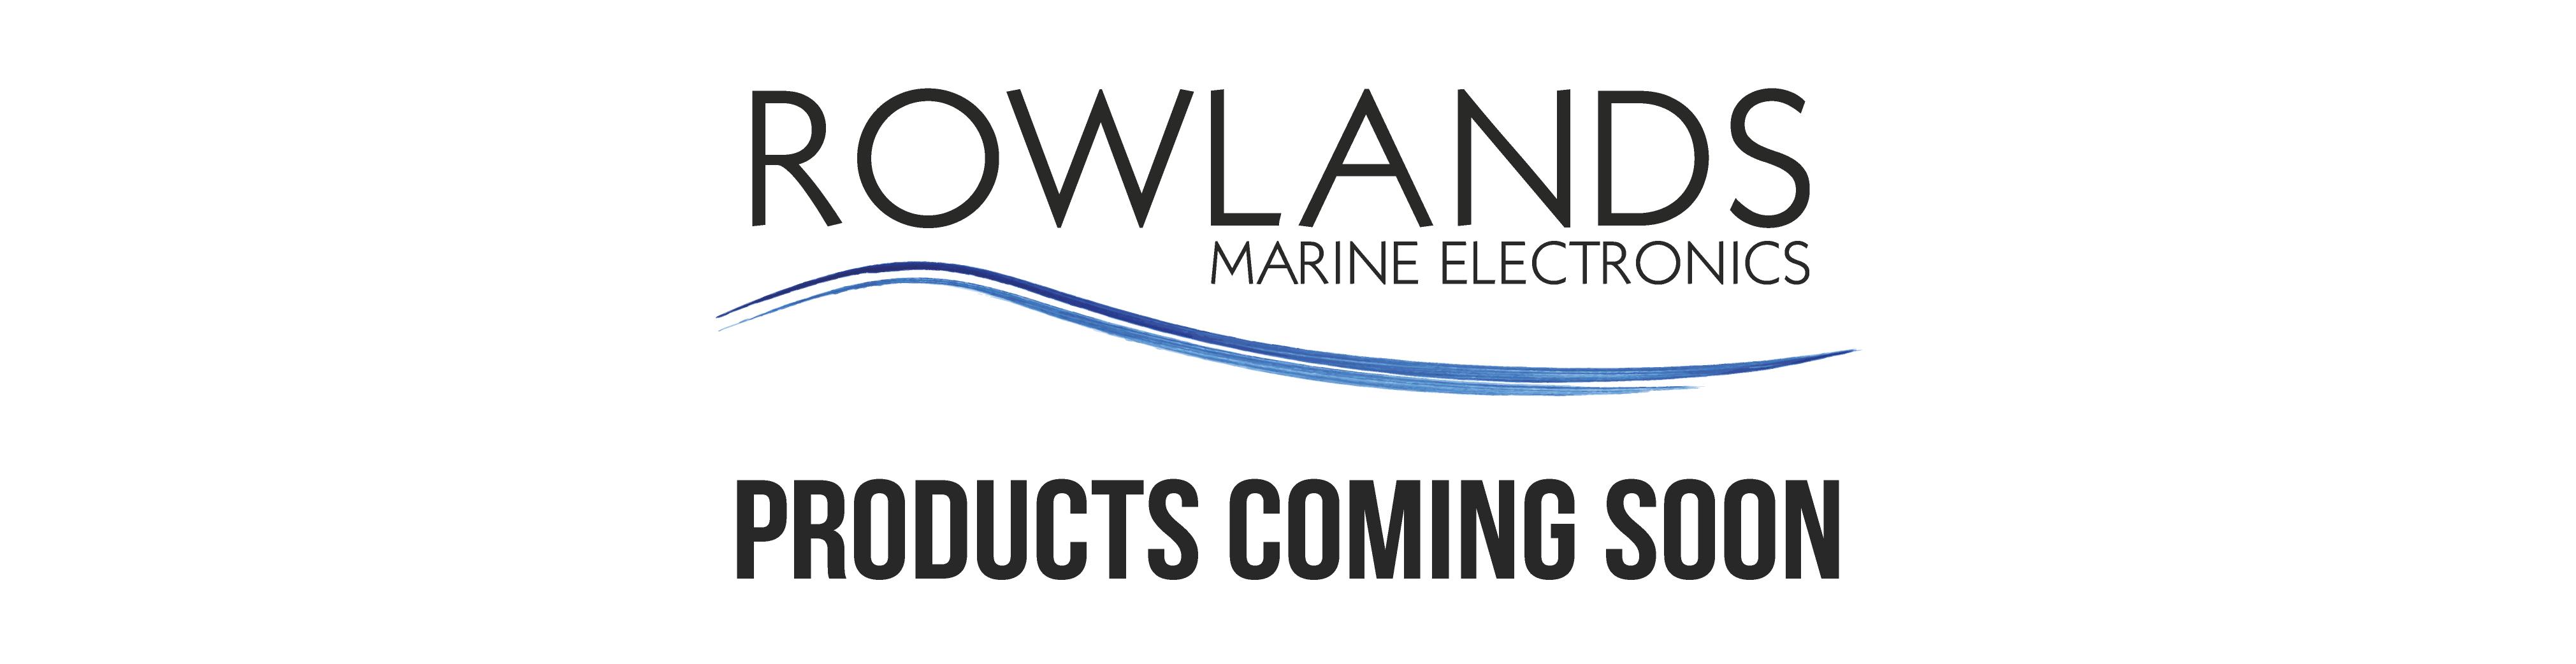 rowlands marine coming soon